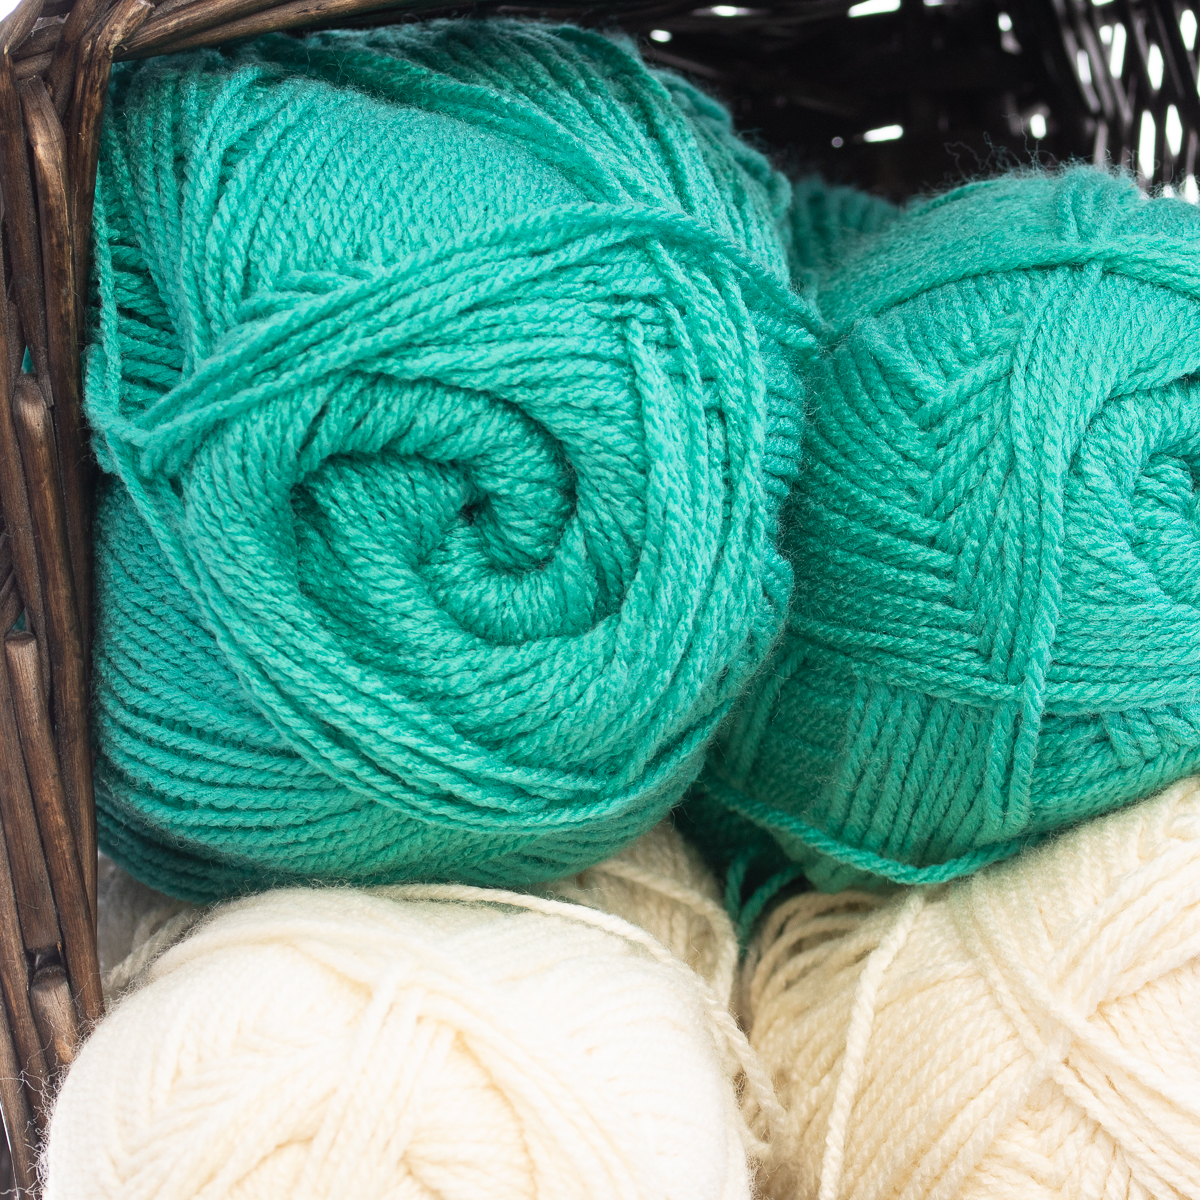 4-Dream-Weaver-Solid-S-Twist-100-Acrylic-Yarn-Skeins-Light-3-Knit-Crochet-Soft thumbnail 21